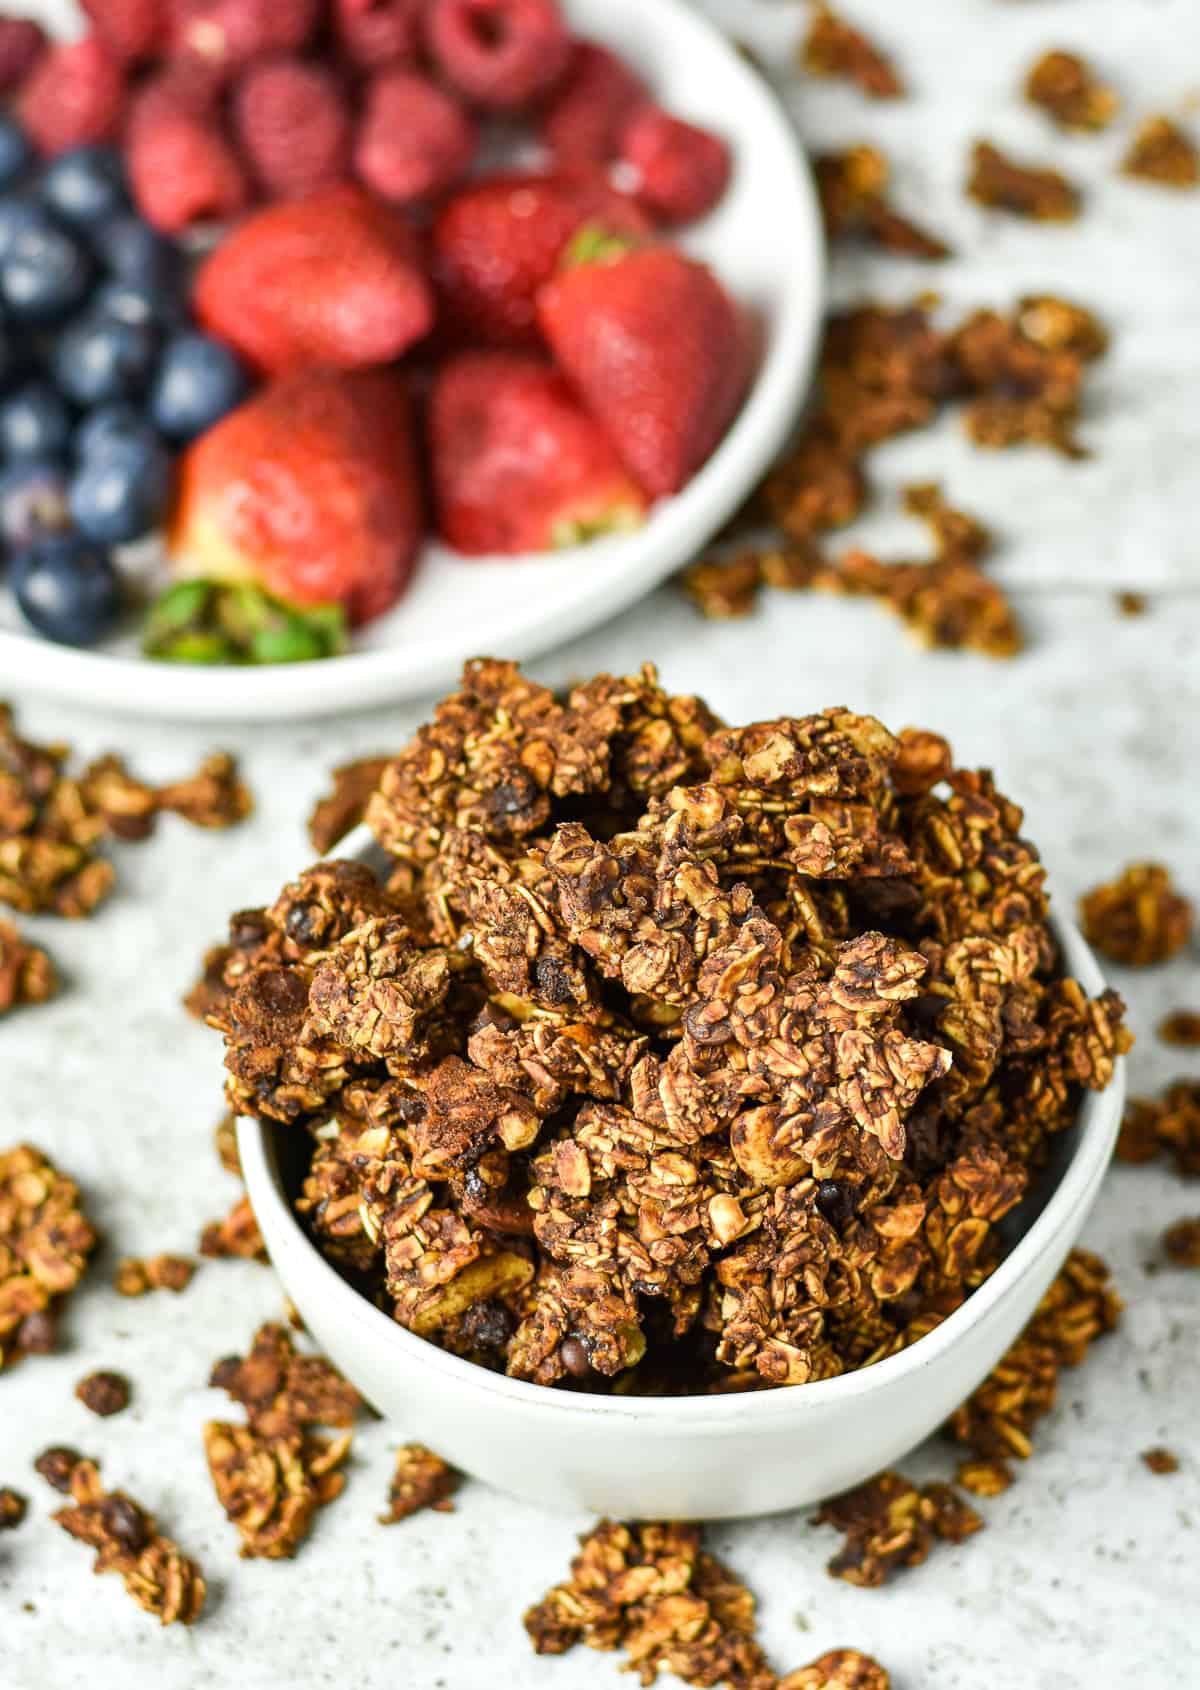 healthy vegan chocolate granola in white bowl.